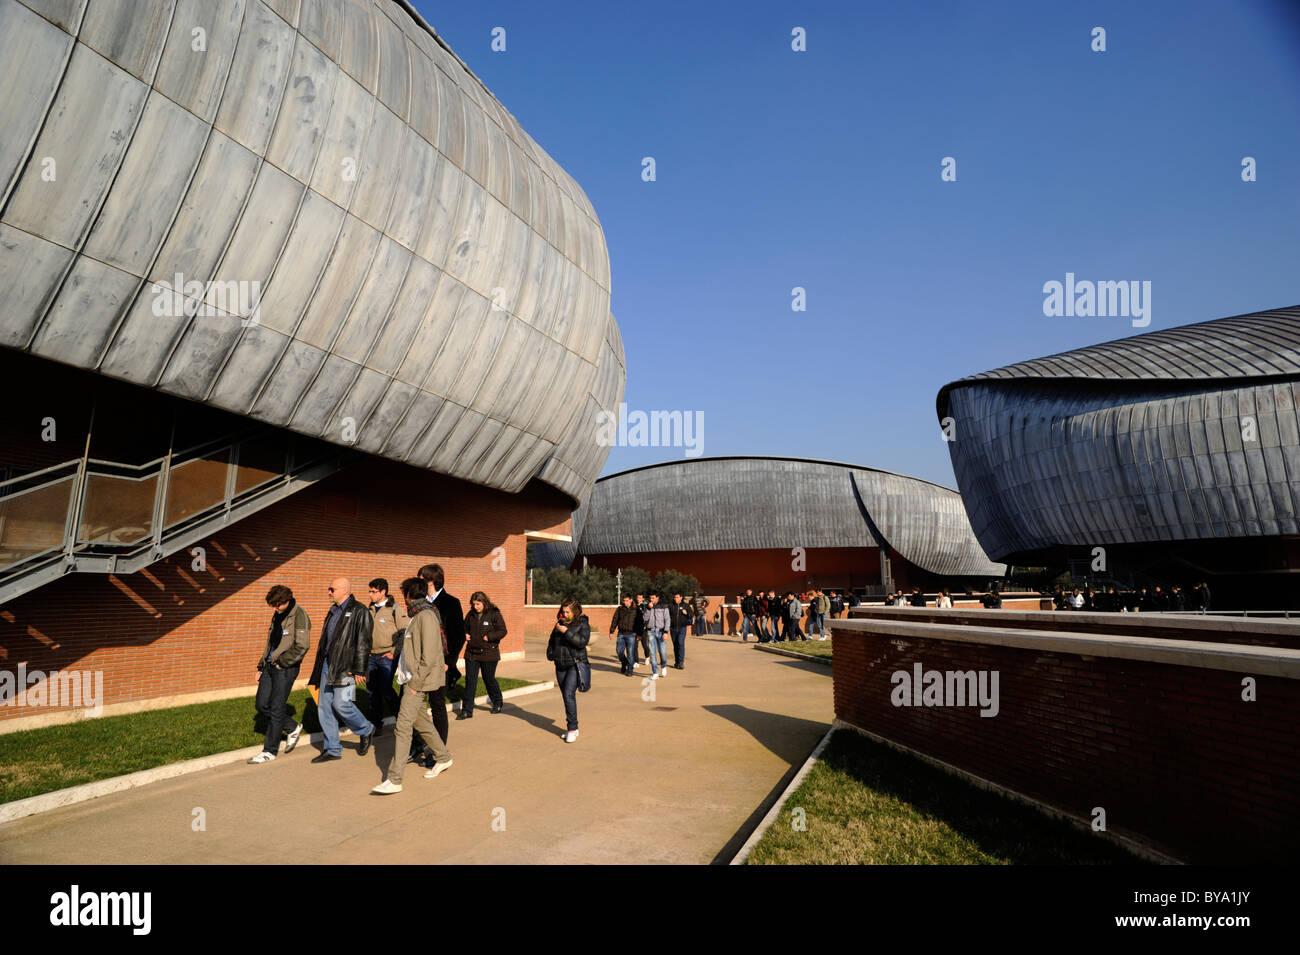 Italie, Rome, l'auditorium Parco della Musica, l'architecte Renzo Piano Banque D'Images